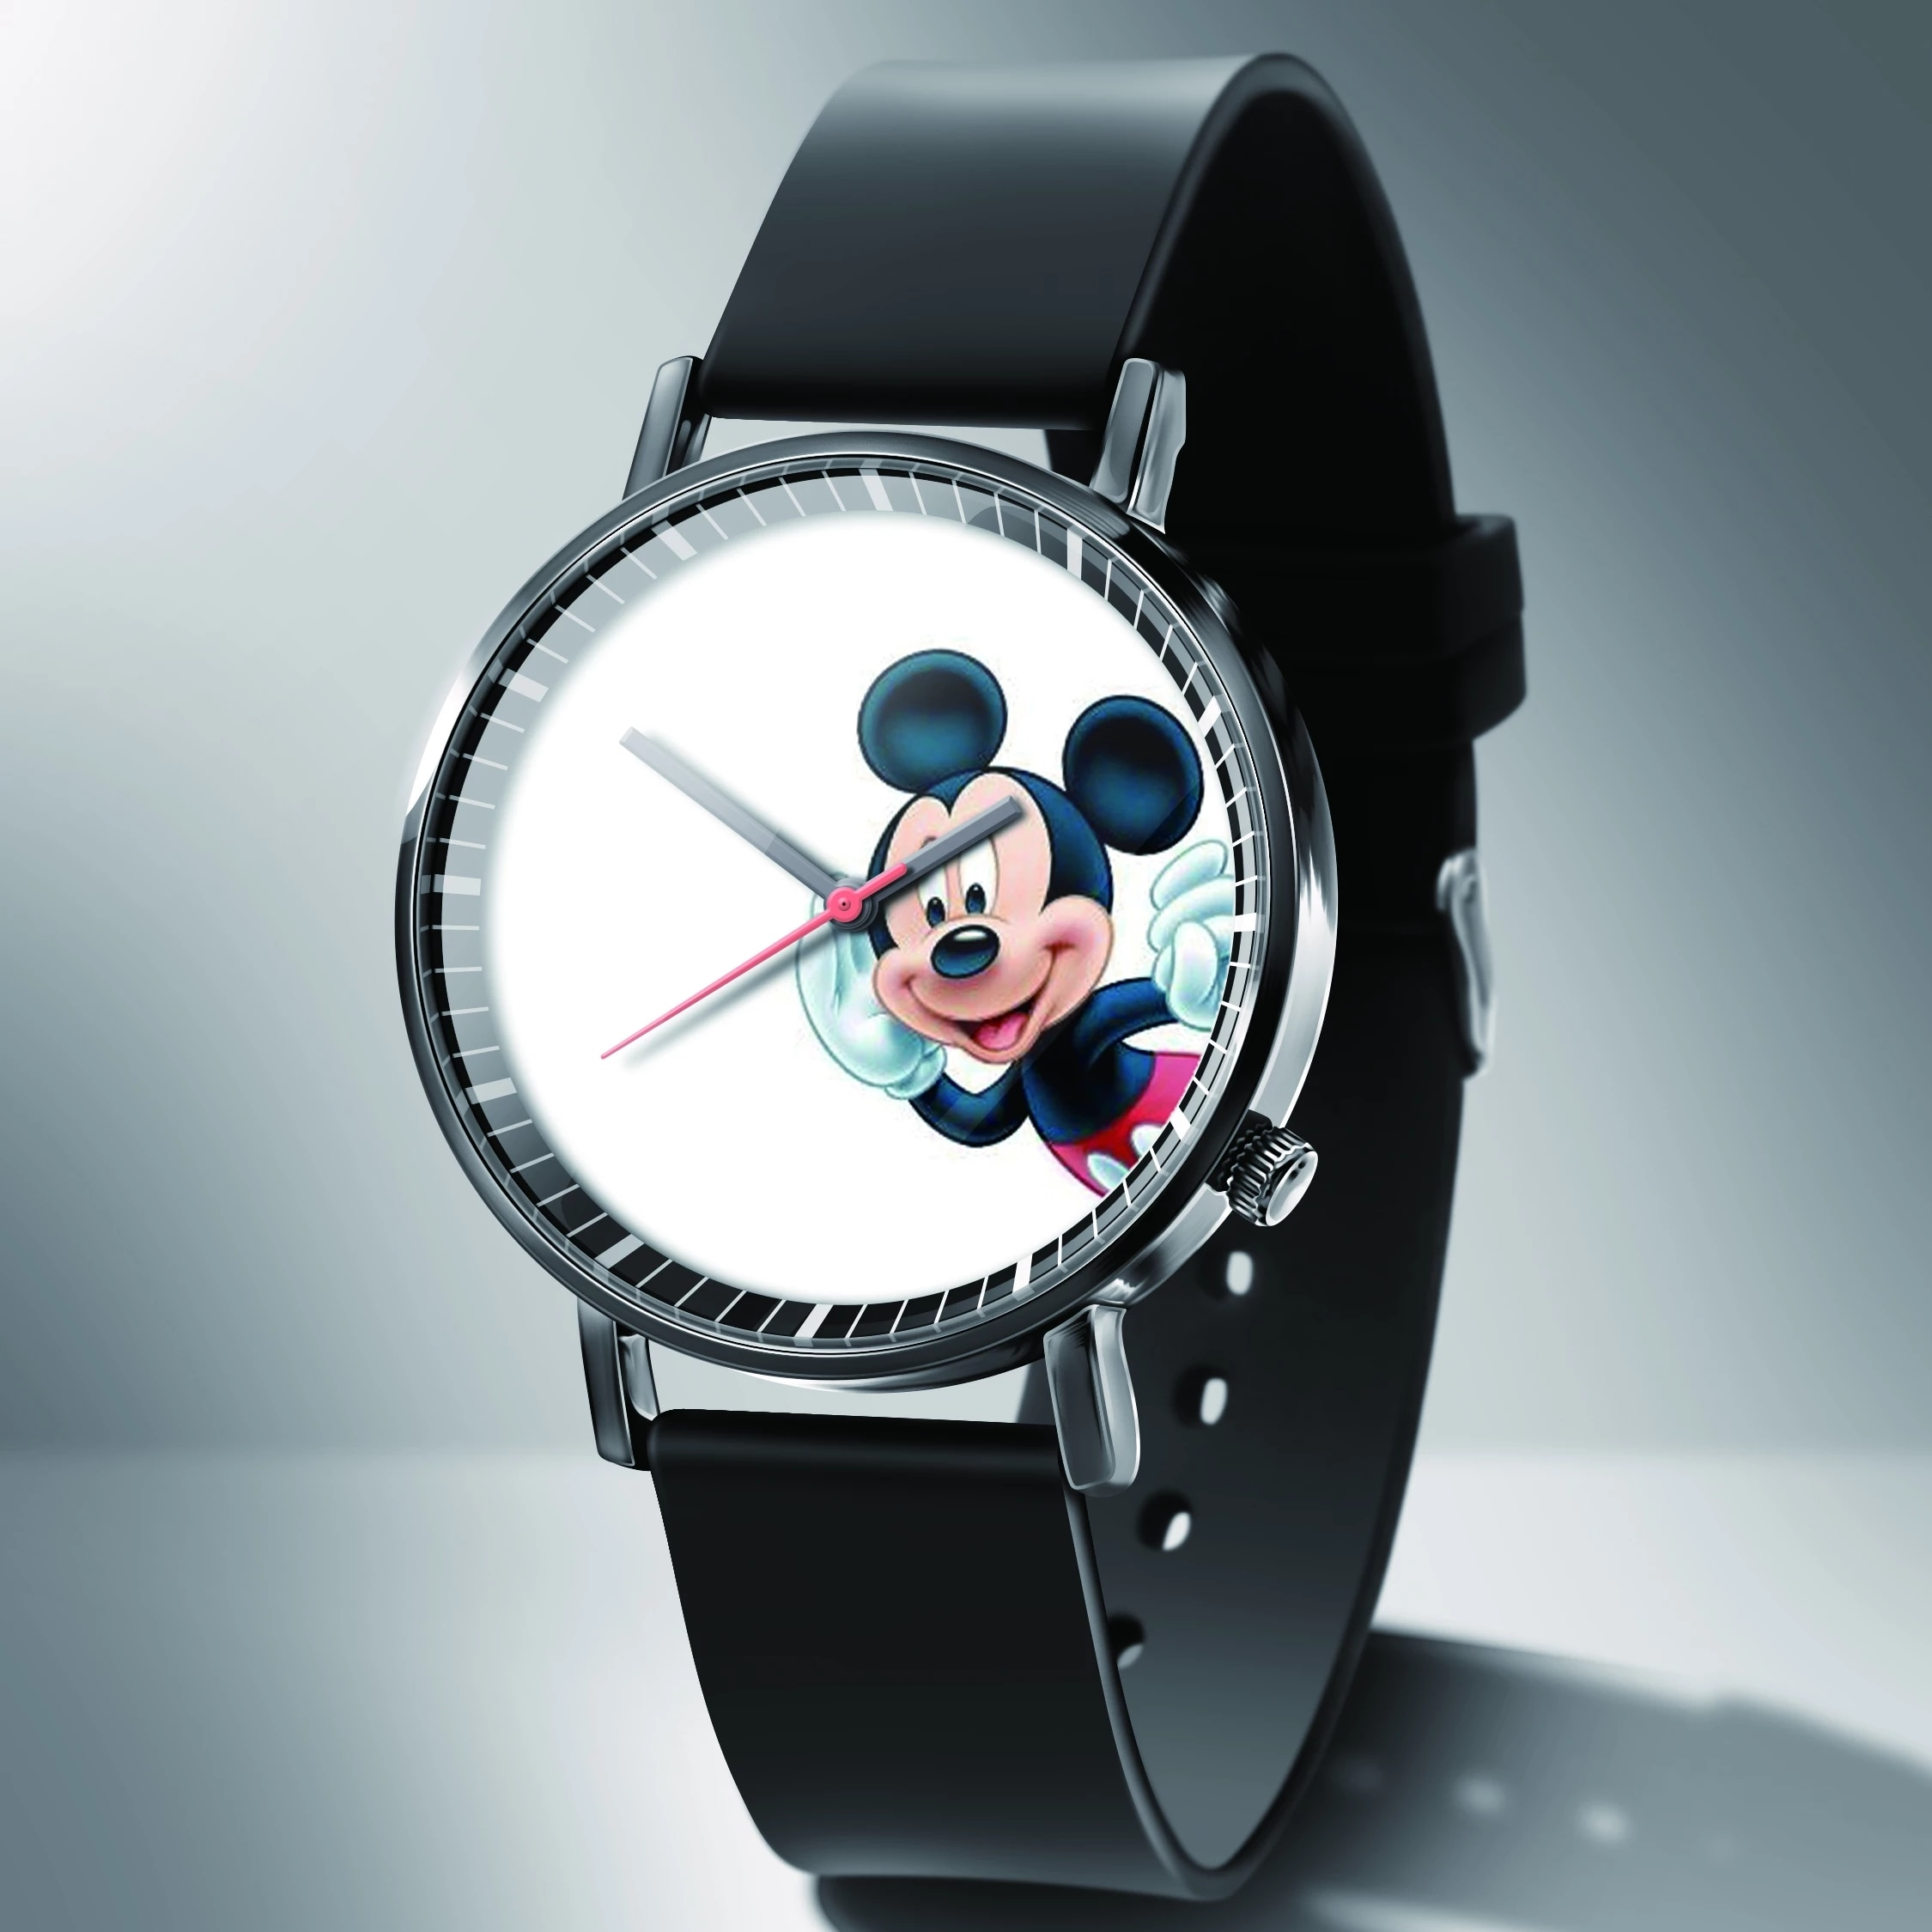 New fashion Mickey Watches Women Men Watch Children Student Anime Cartoon Quartz Wristwatches Relogio feminino Zegarek Damski